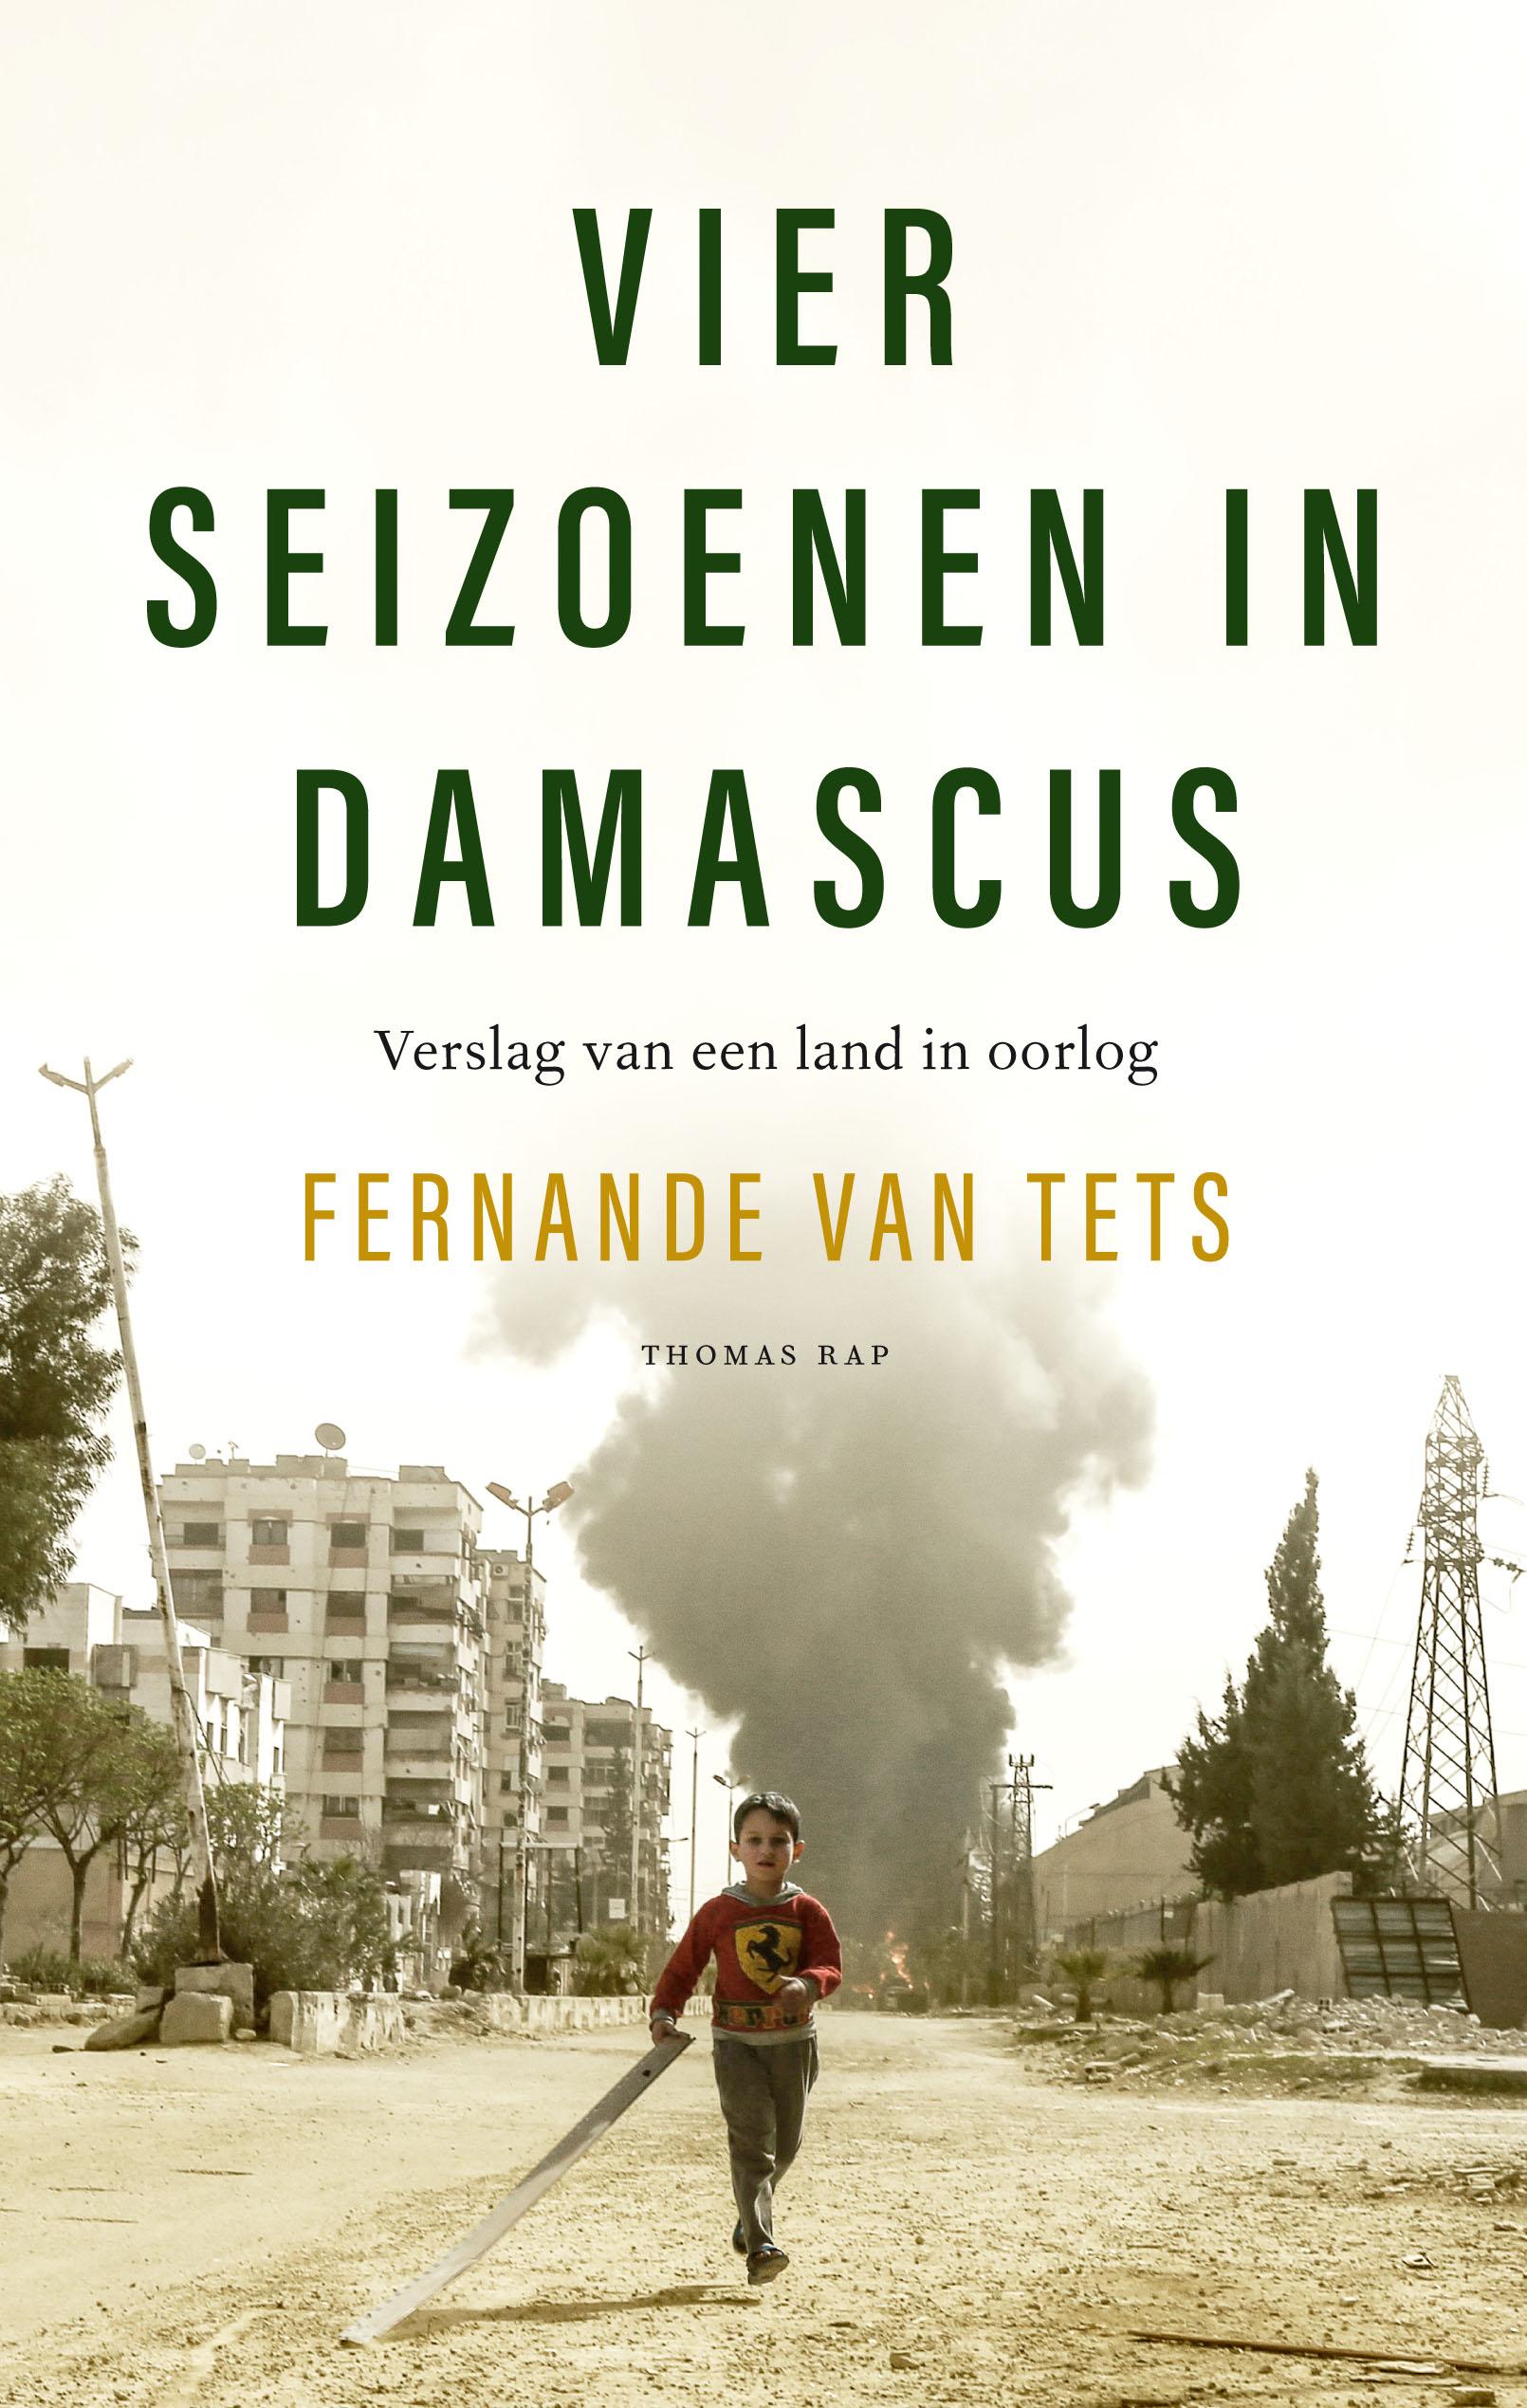 Vier seizoenen in Damascus - boekenflits